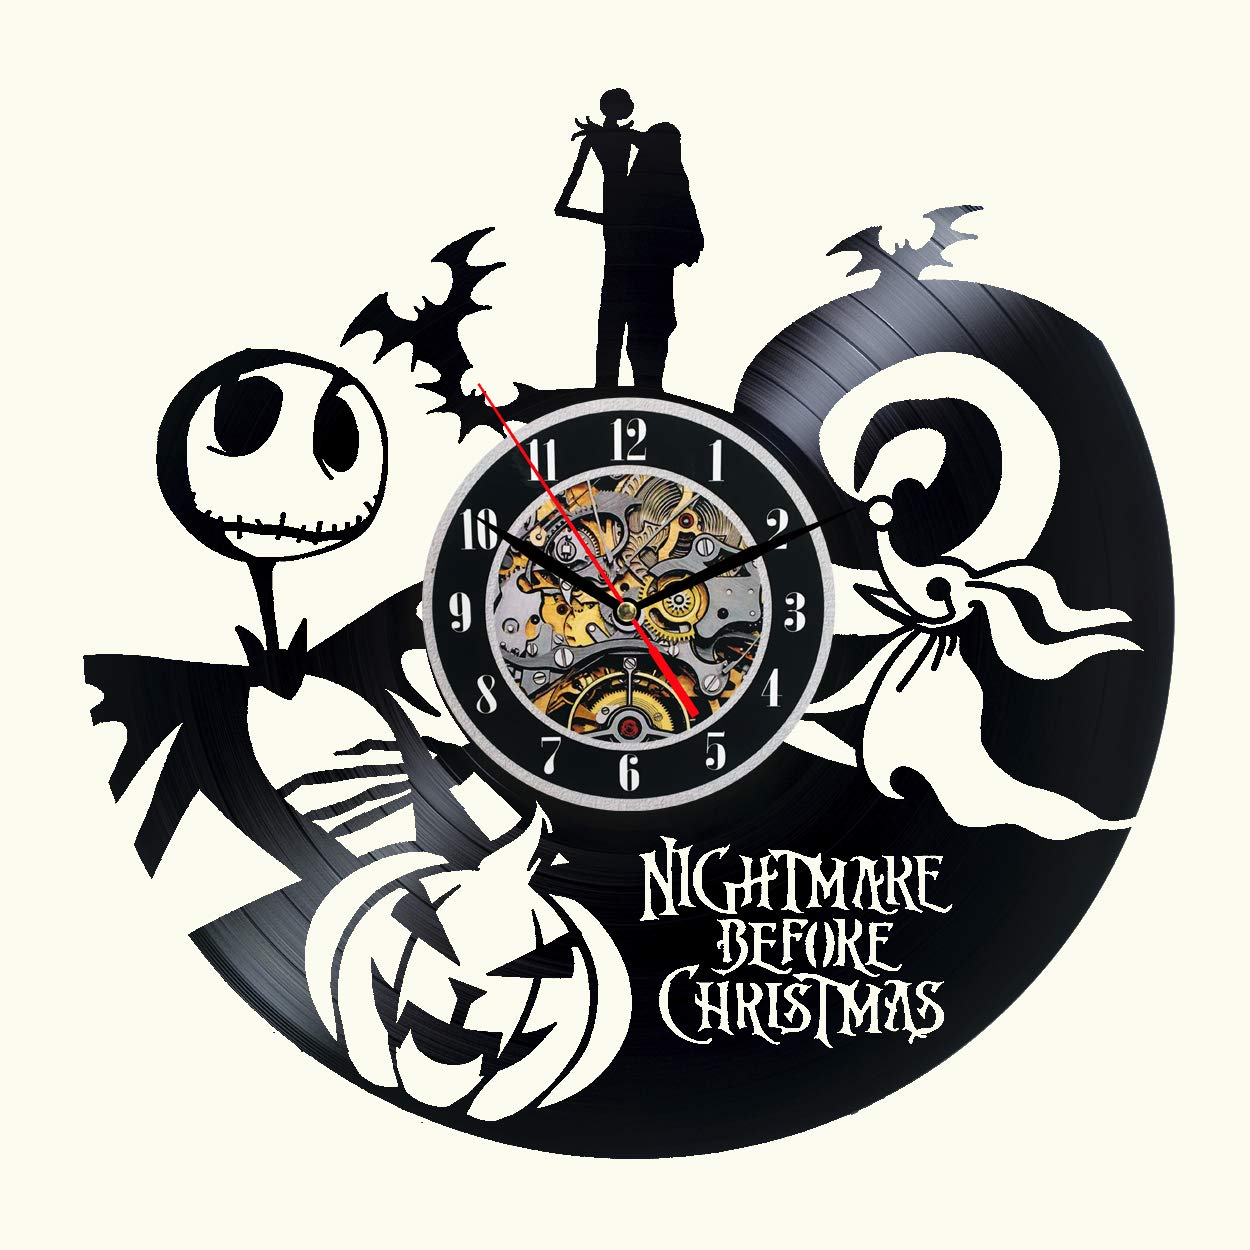 The Nightmare Before Christmas Vinyl Wall Clock 12 in Black Decor ...